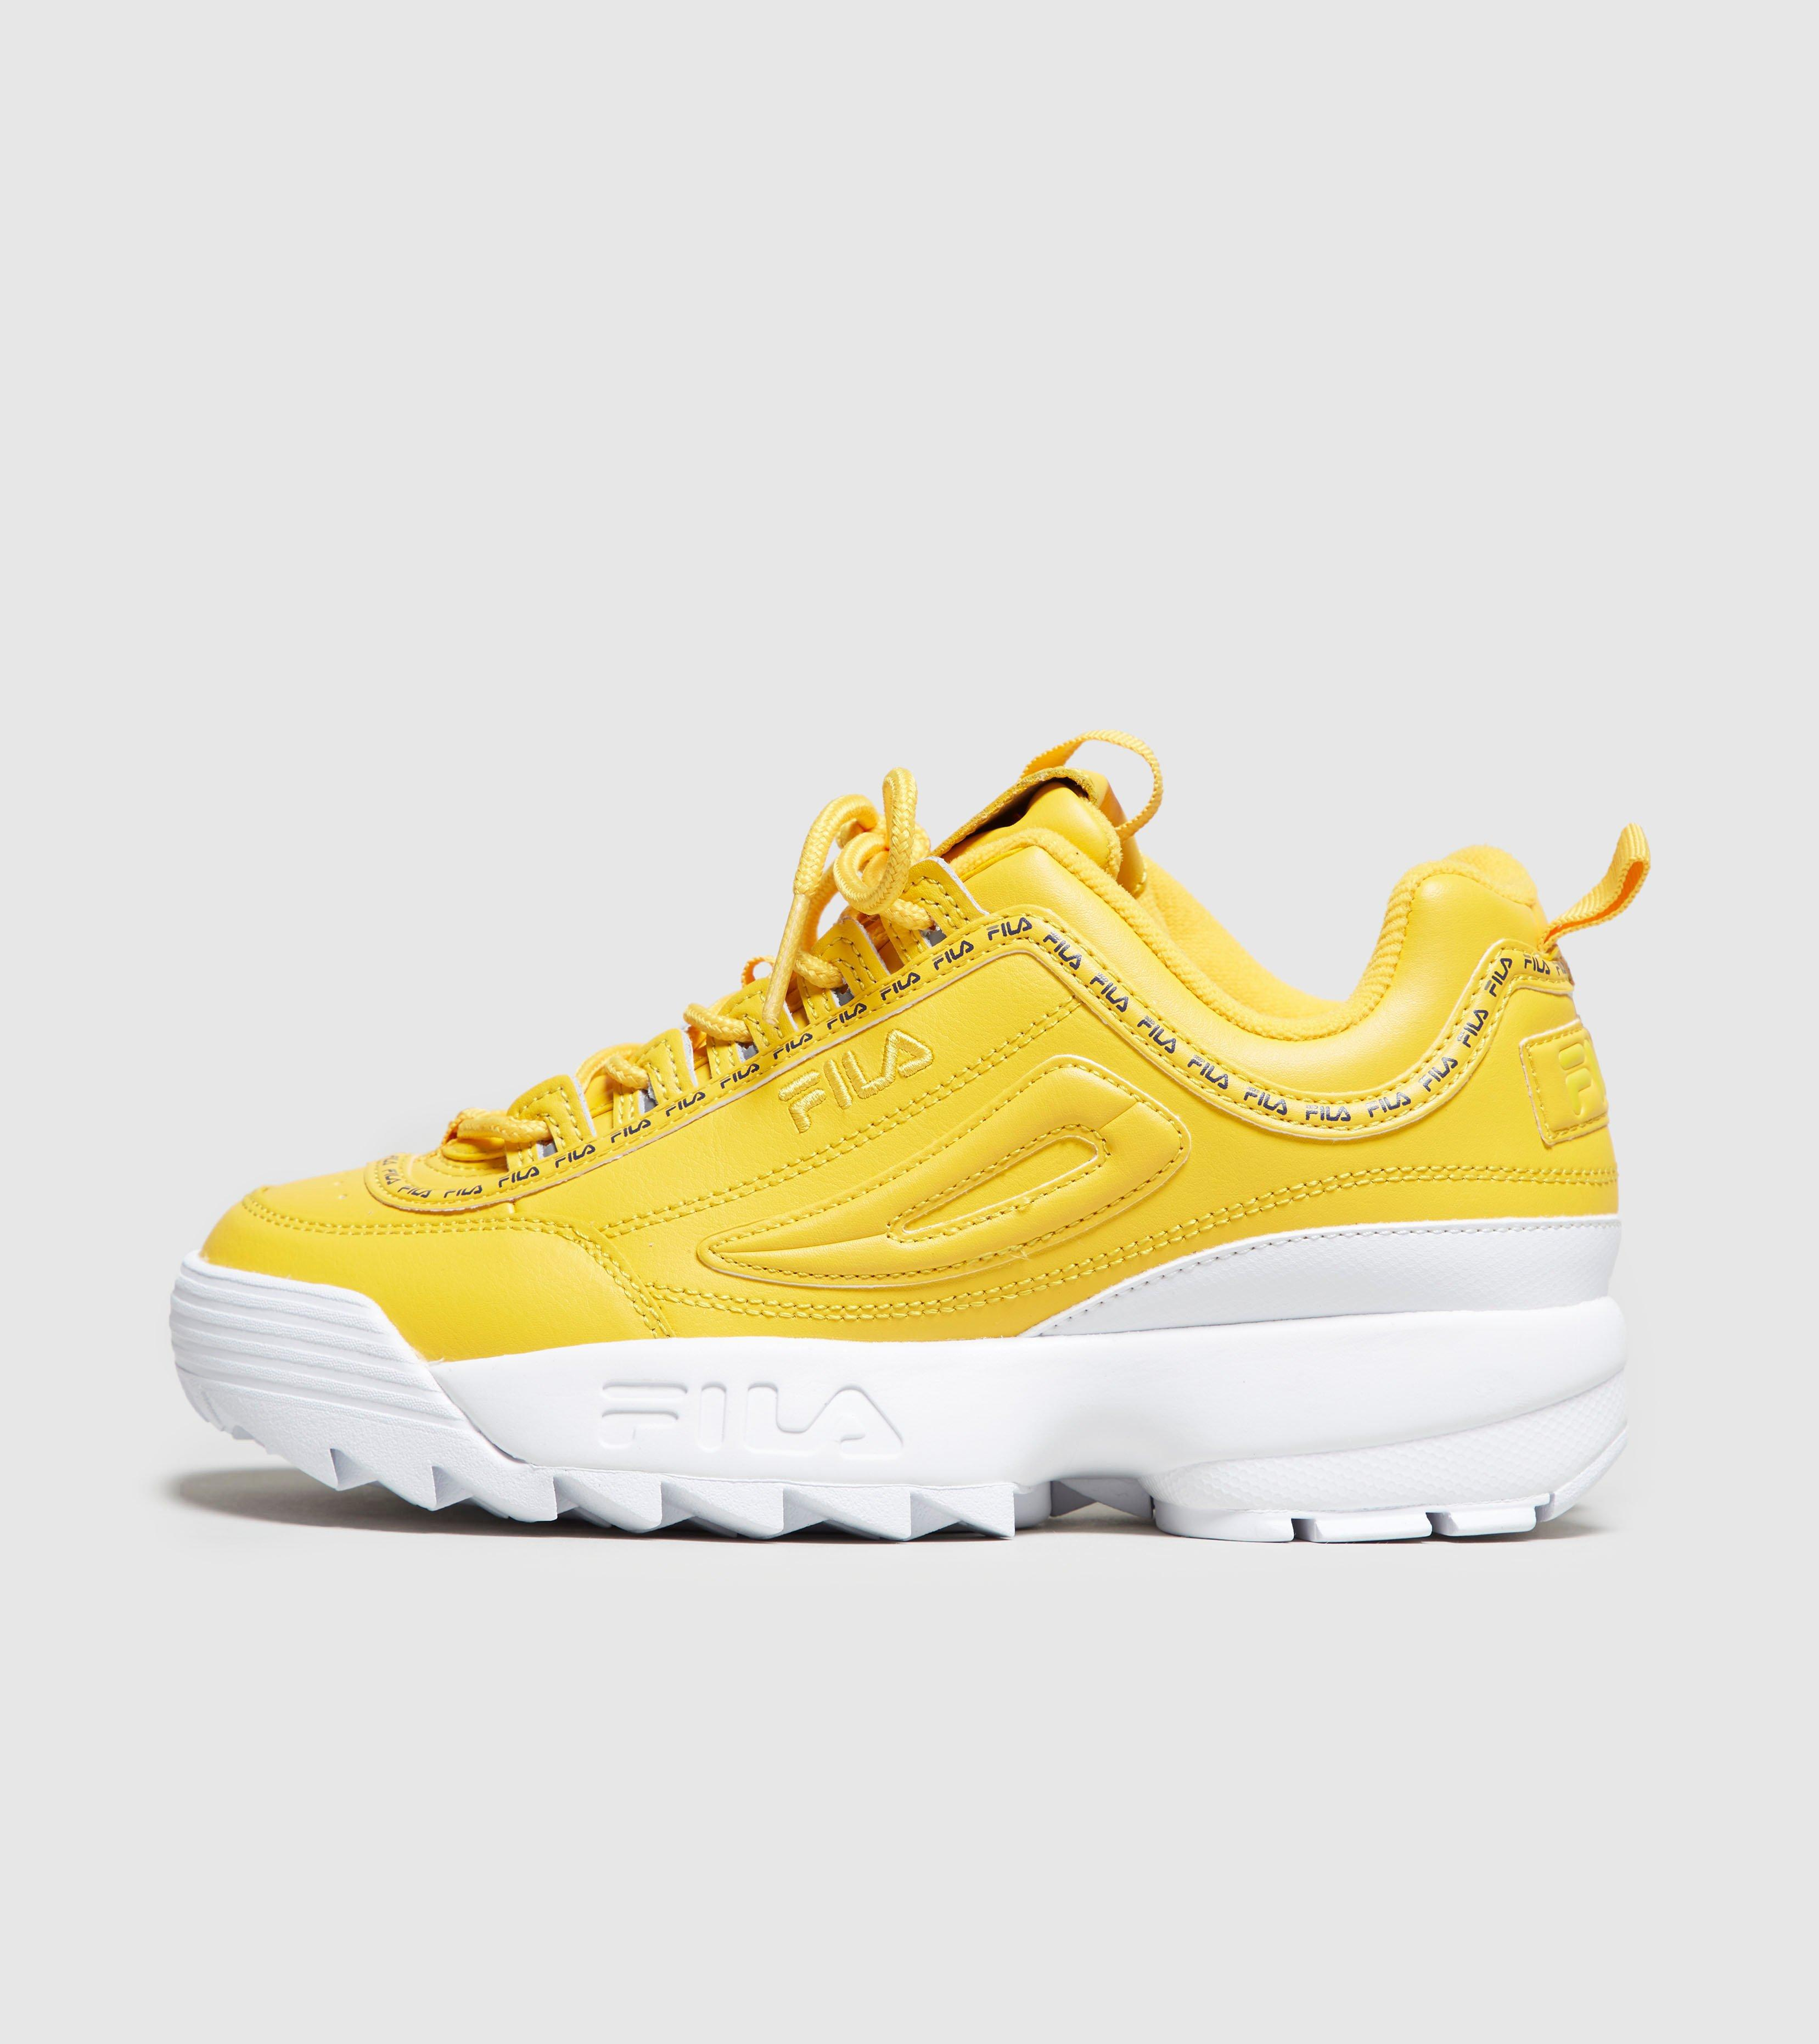 53af910e2be9 Fila Disruptor Ii Women s in Yellow - Lyst